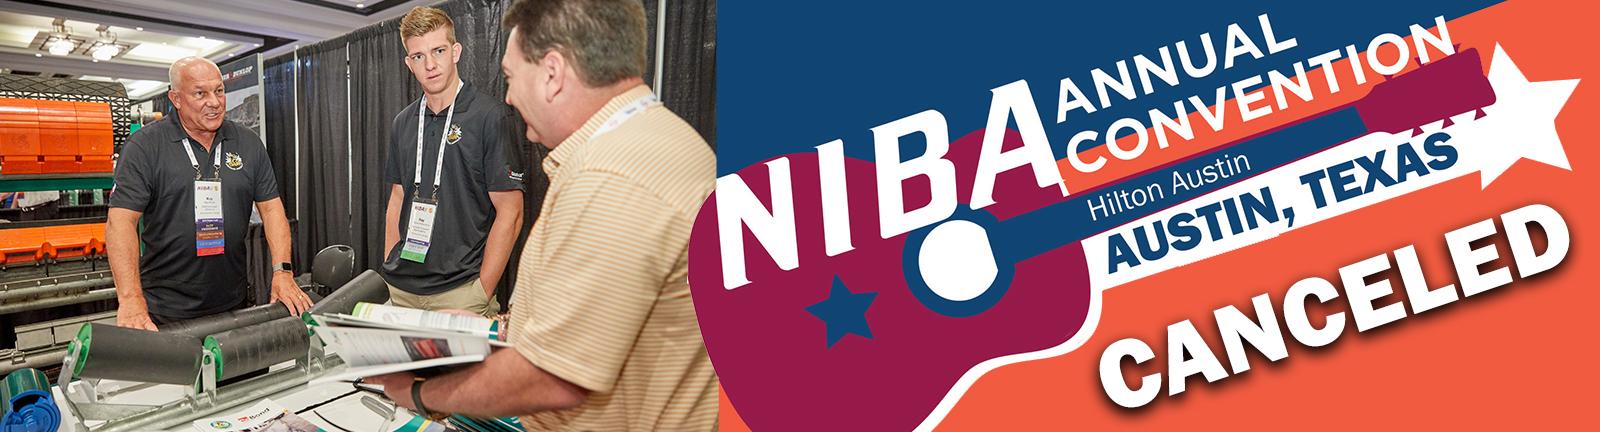 NIBA2020 banner image canceled